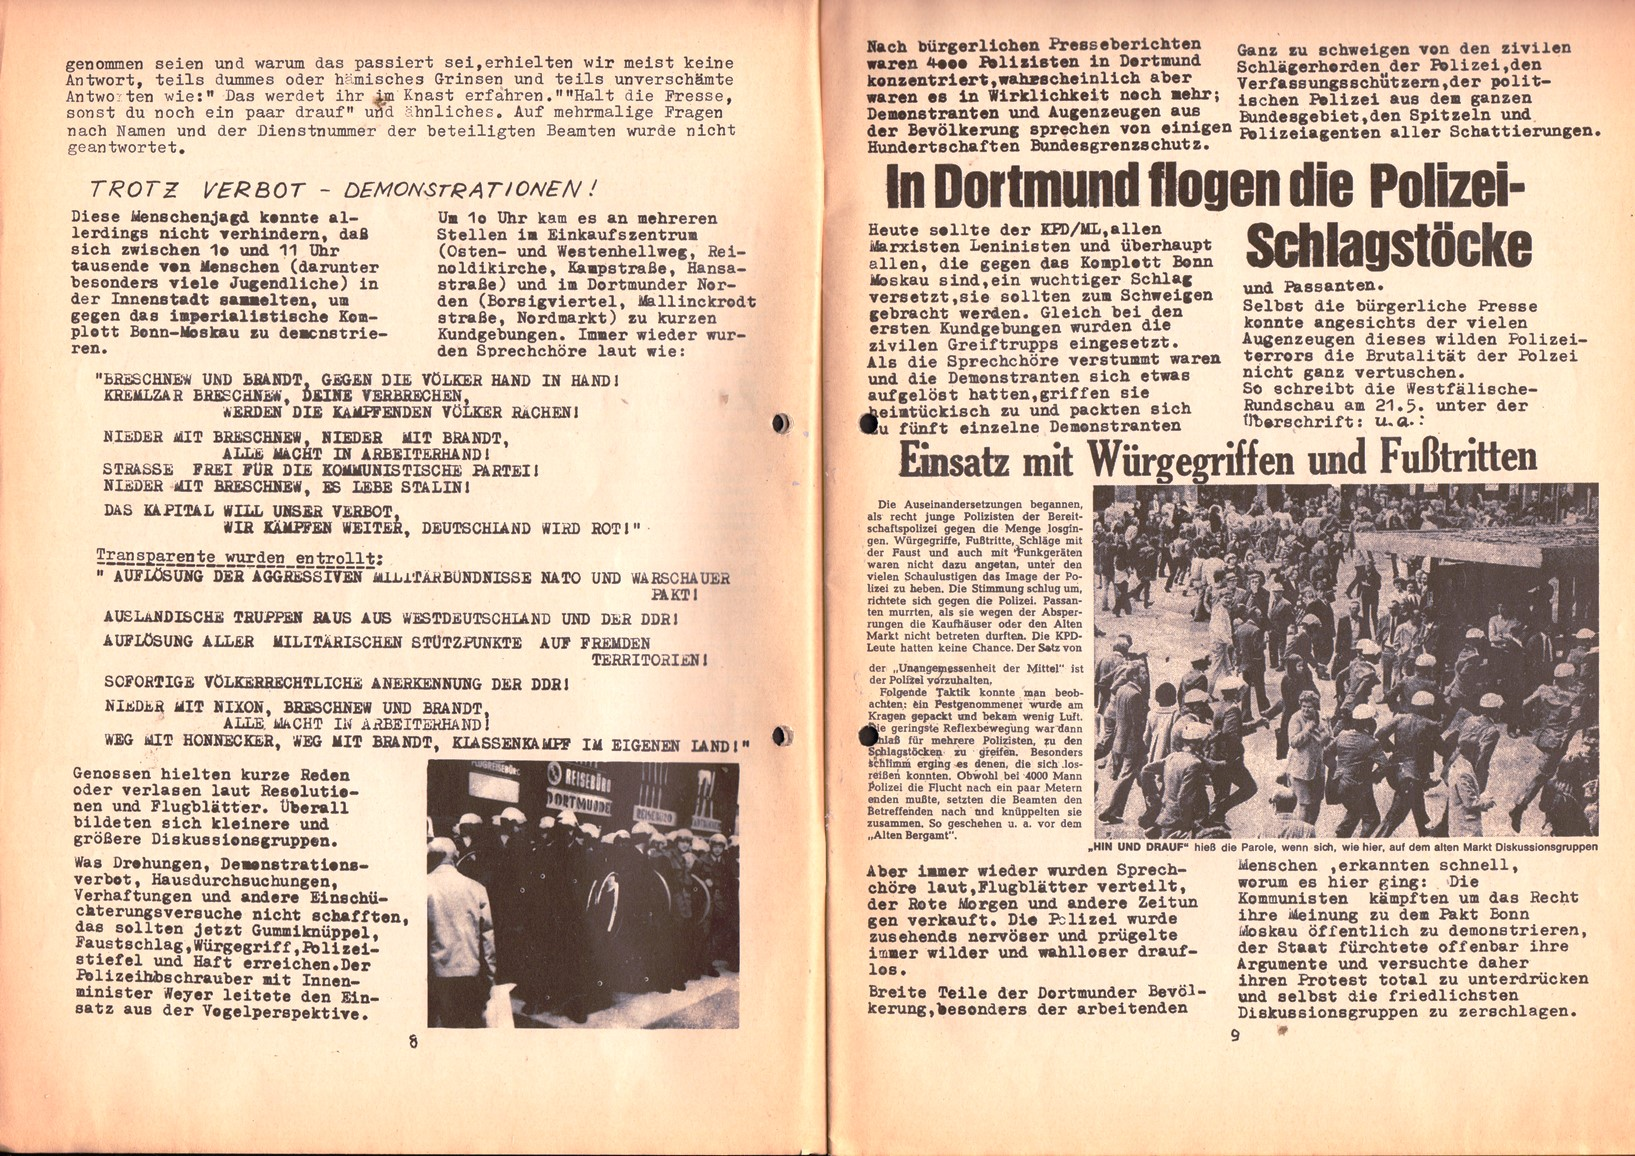 KPDML_1973_Breschnew_Besuch_in_Bonn_05